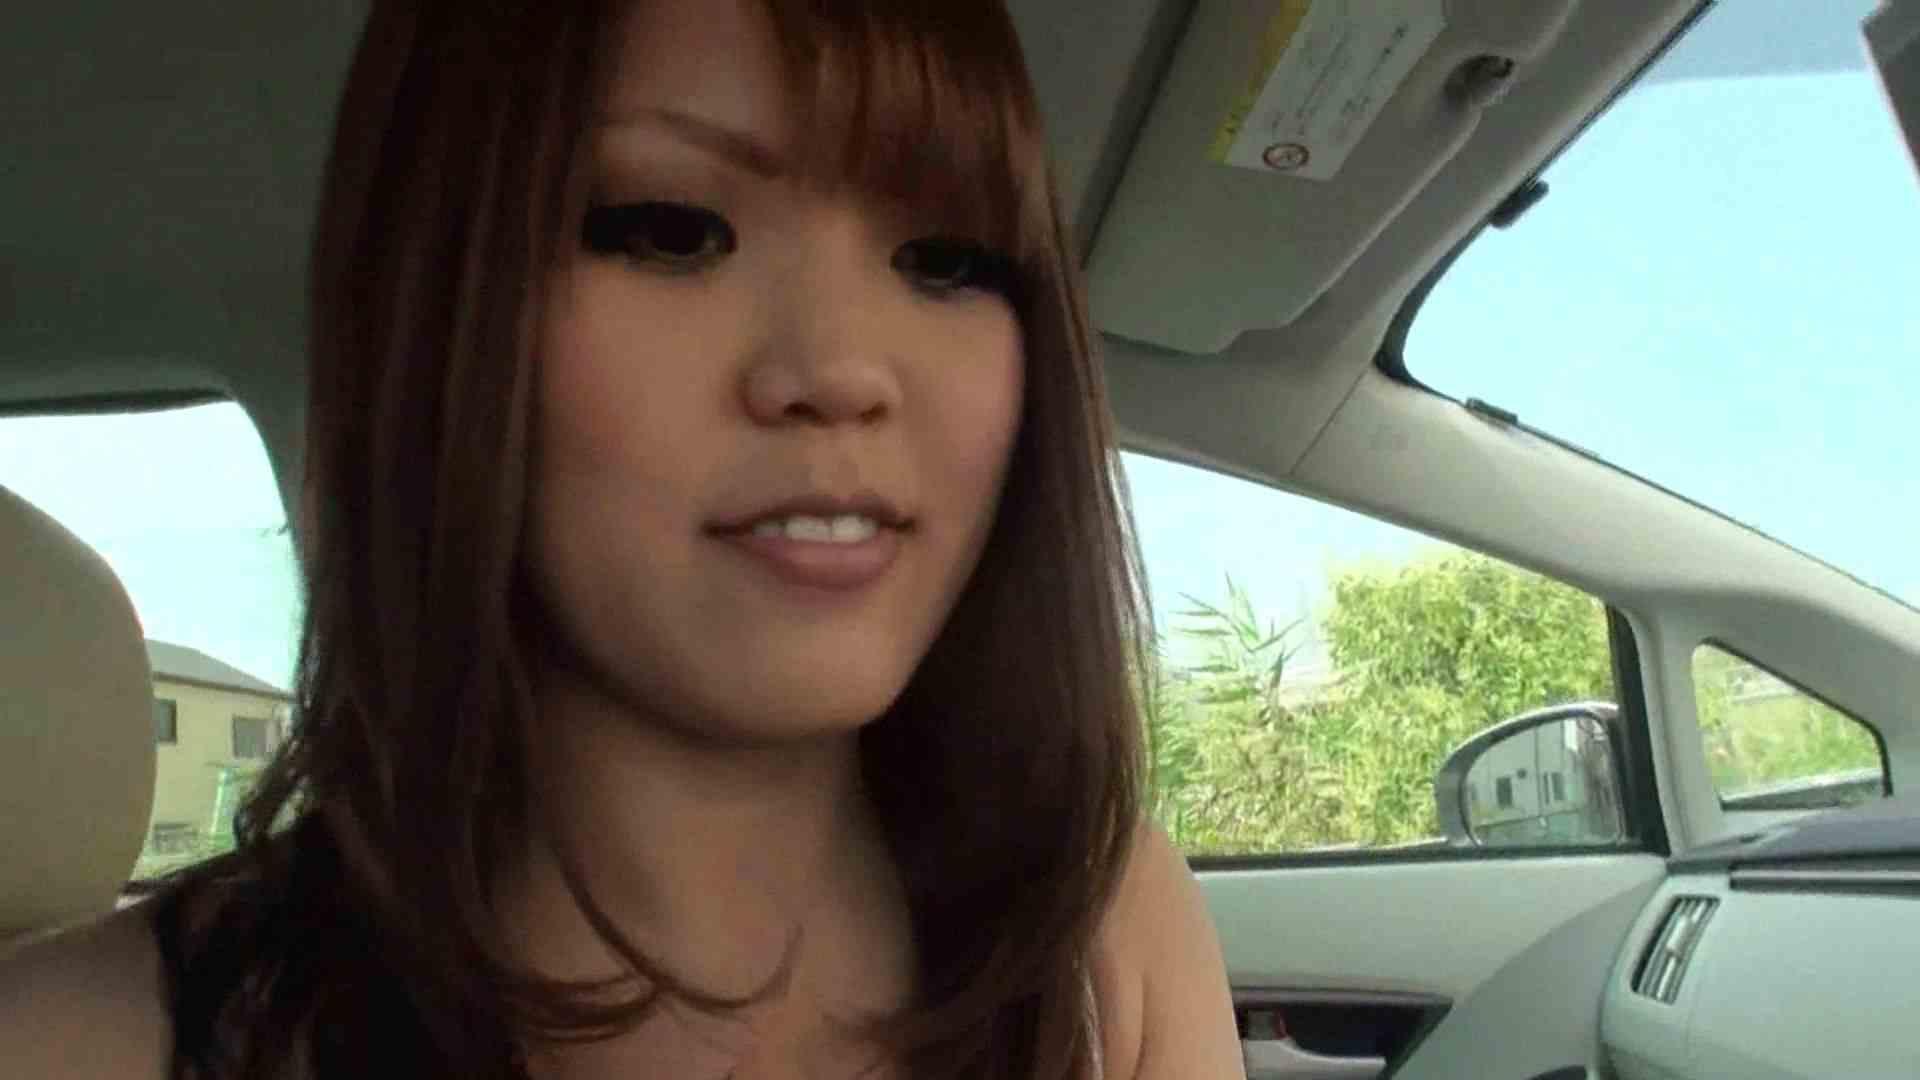 S級厳選美女ビッチガールVol.50 前編 モデル   美女OL  101連発 25